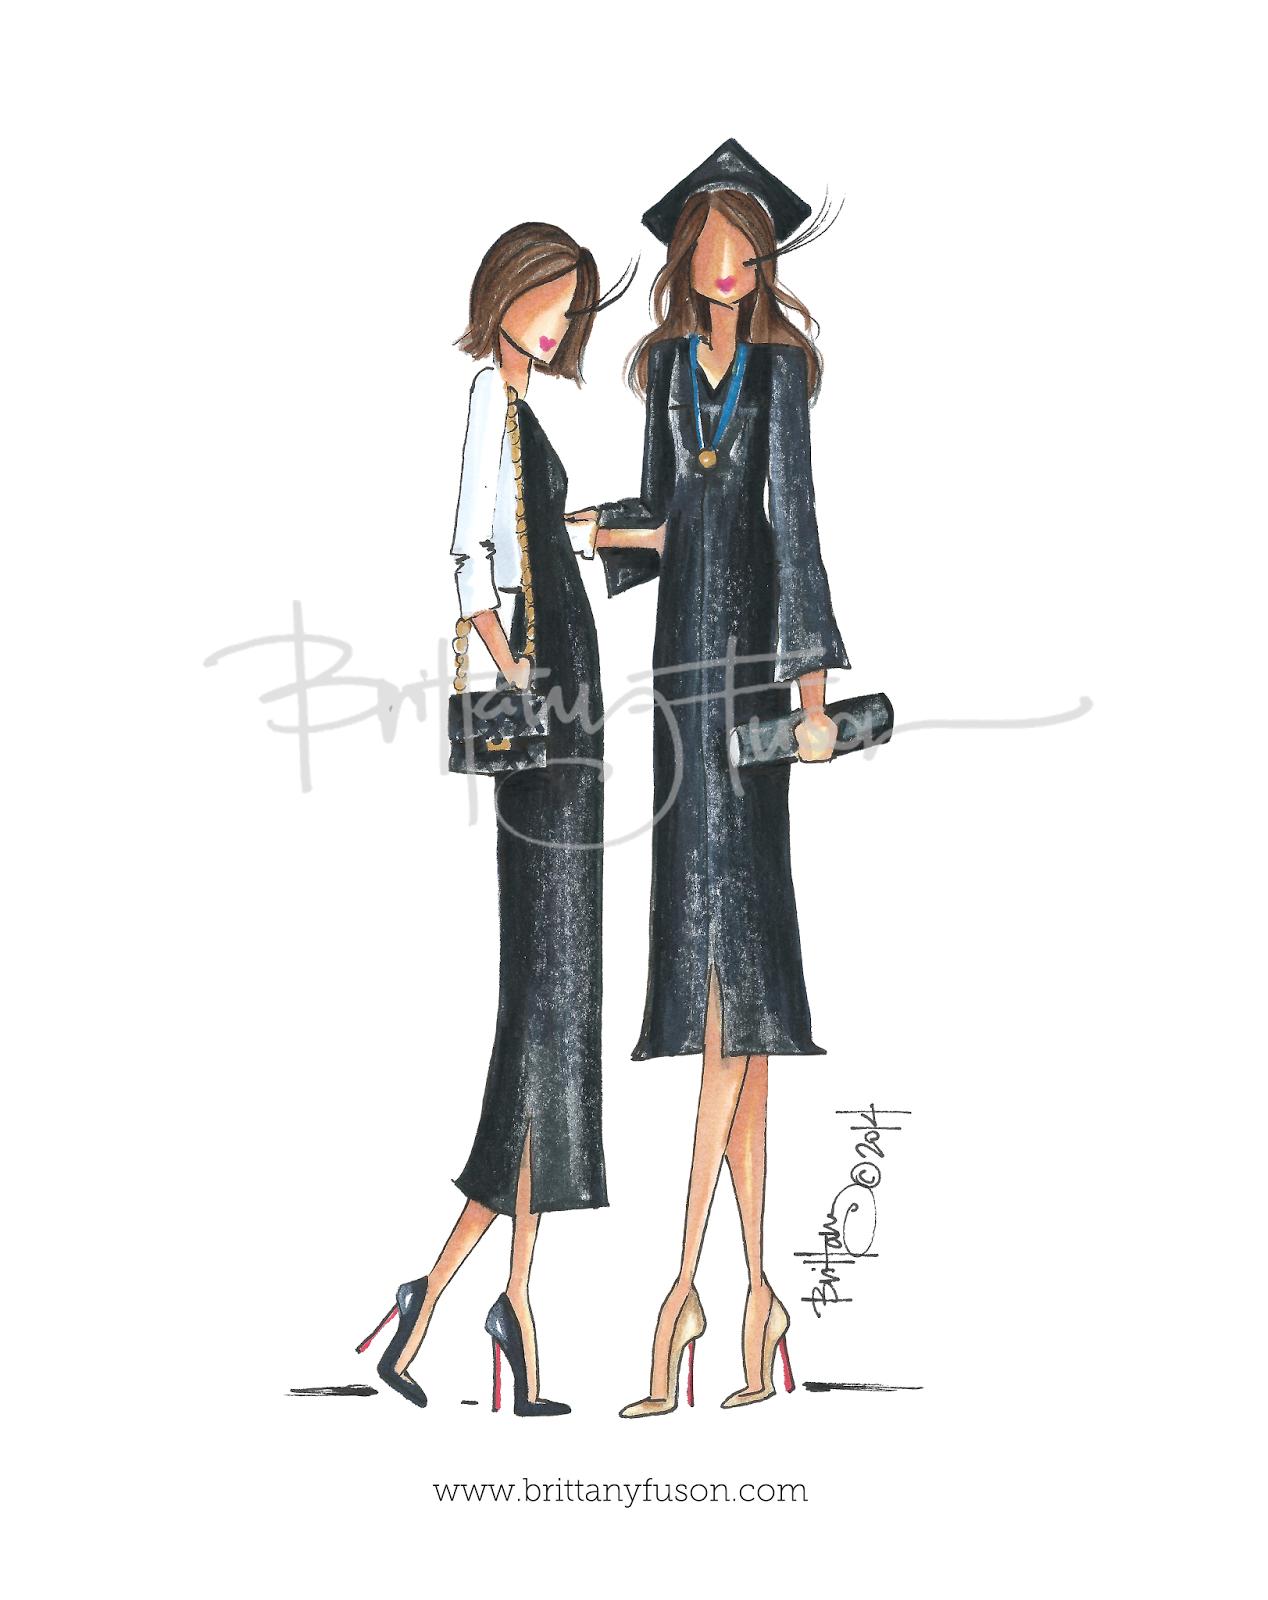 fashionillustr.quenalbertini: The Story of Life 1 by Britanny Fuson